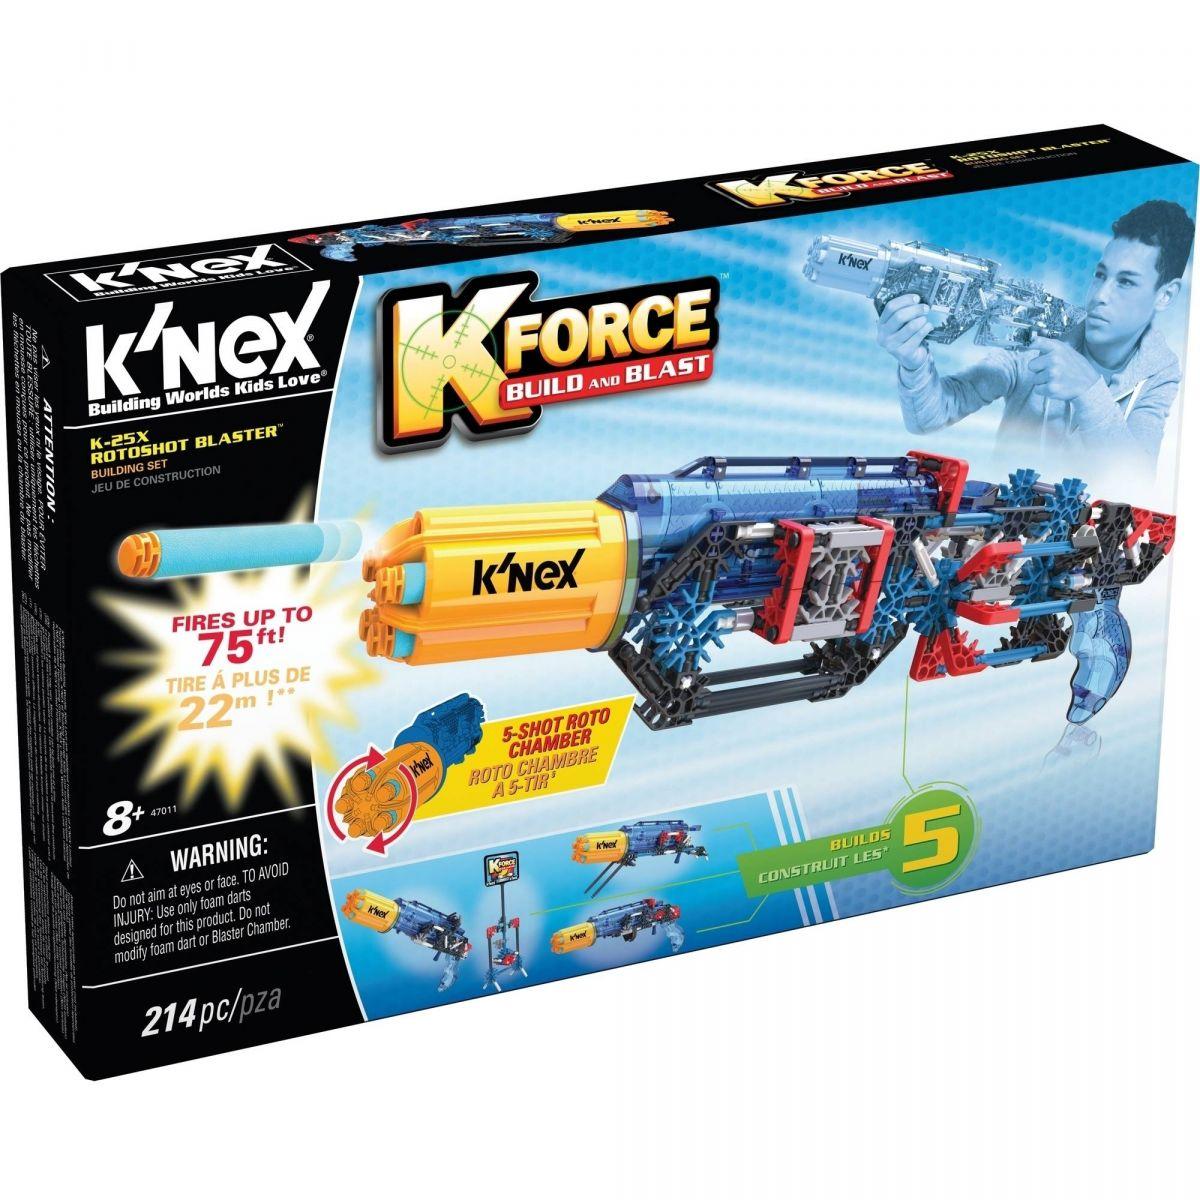 KNex Pistole K 25X Roto Blaster